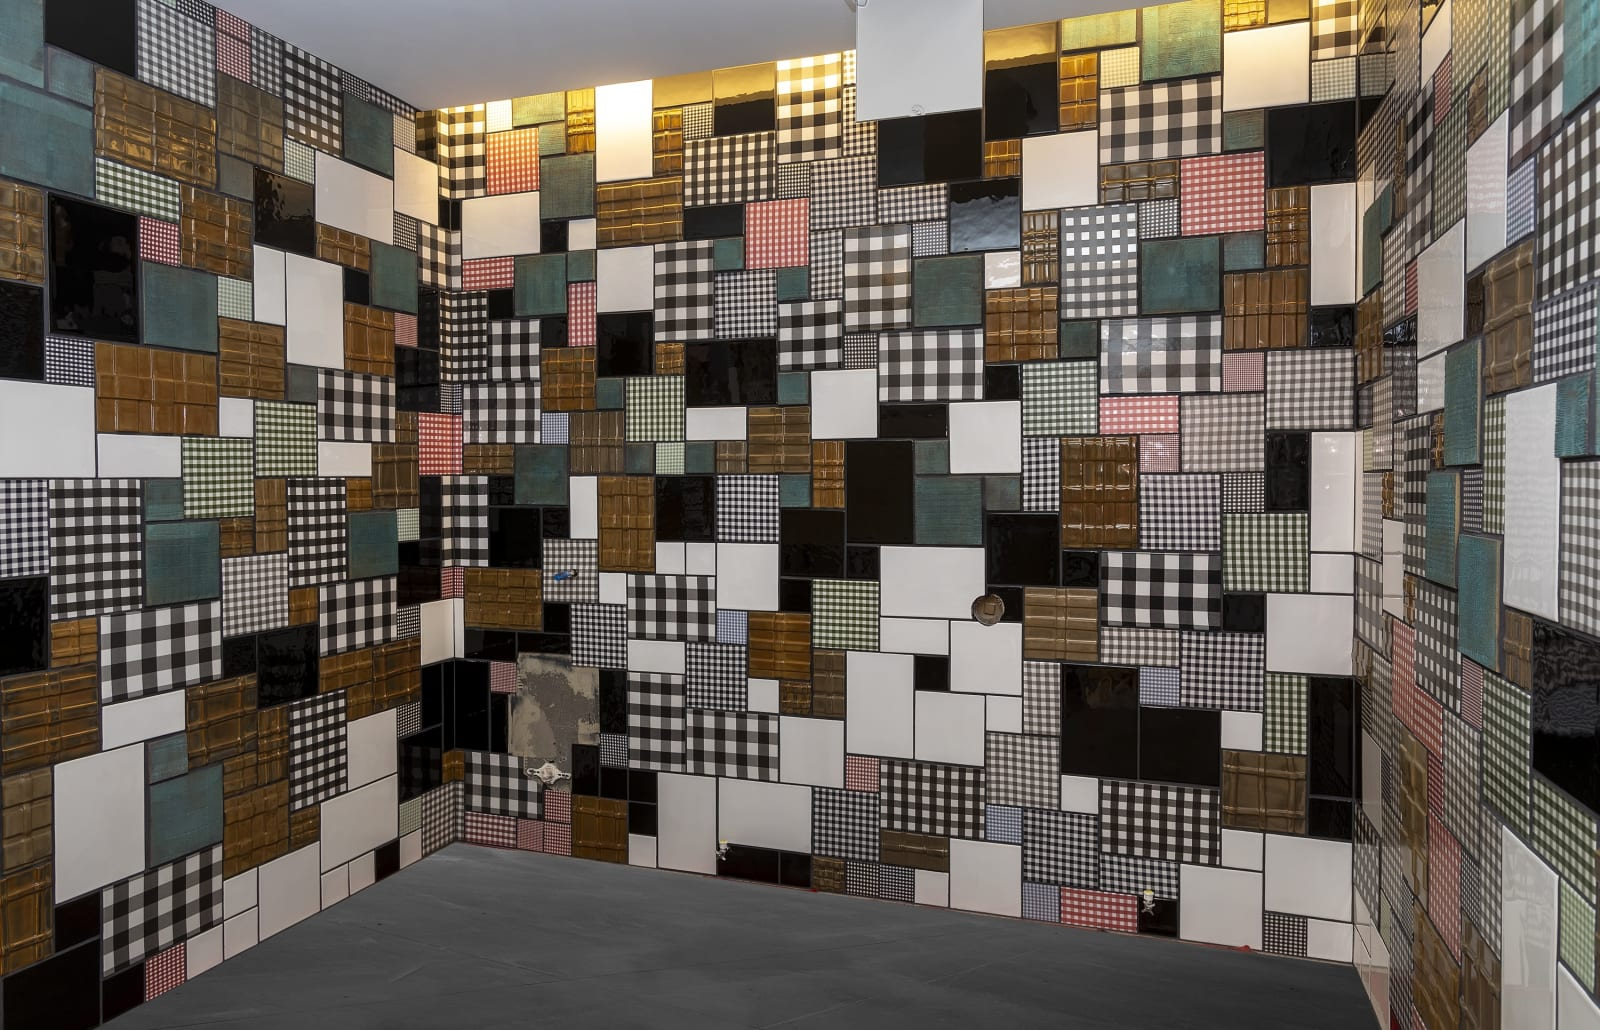 Installation view, Michelle Grabner, Site-specific installation for the Arts Preserve at the John Kohler Arts Center, Sheboygan, WI, 2020